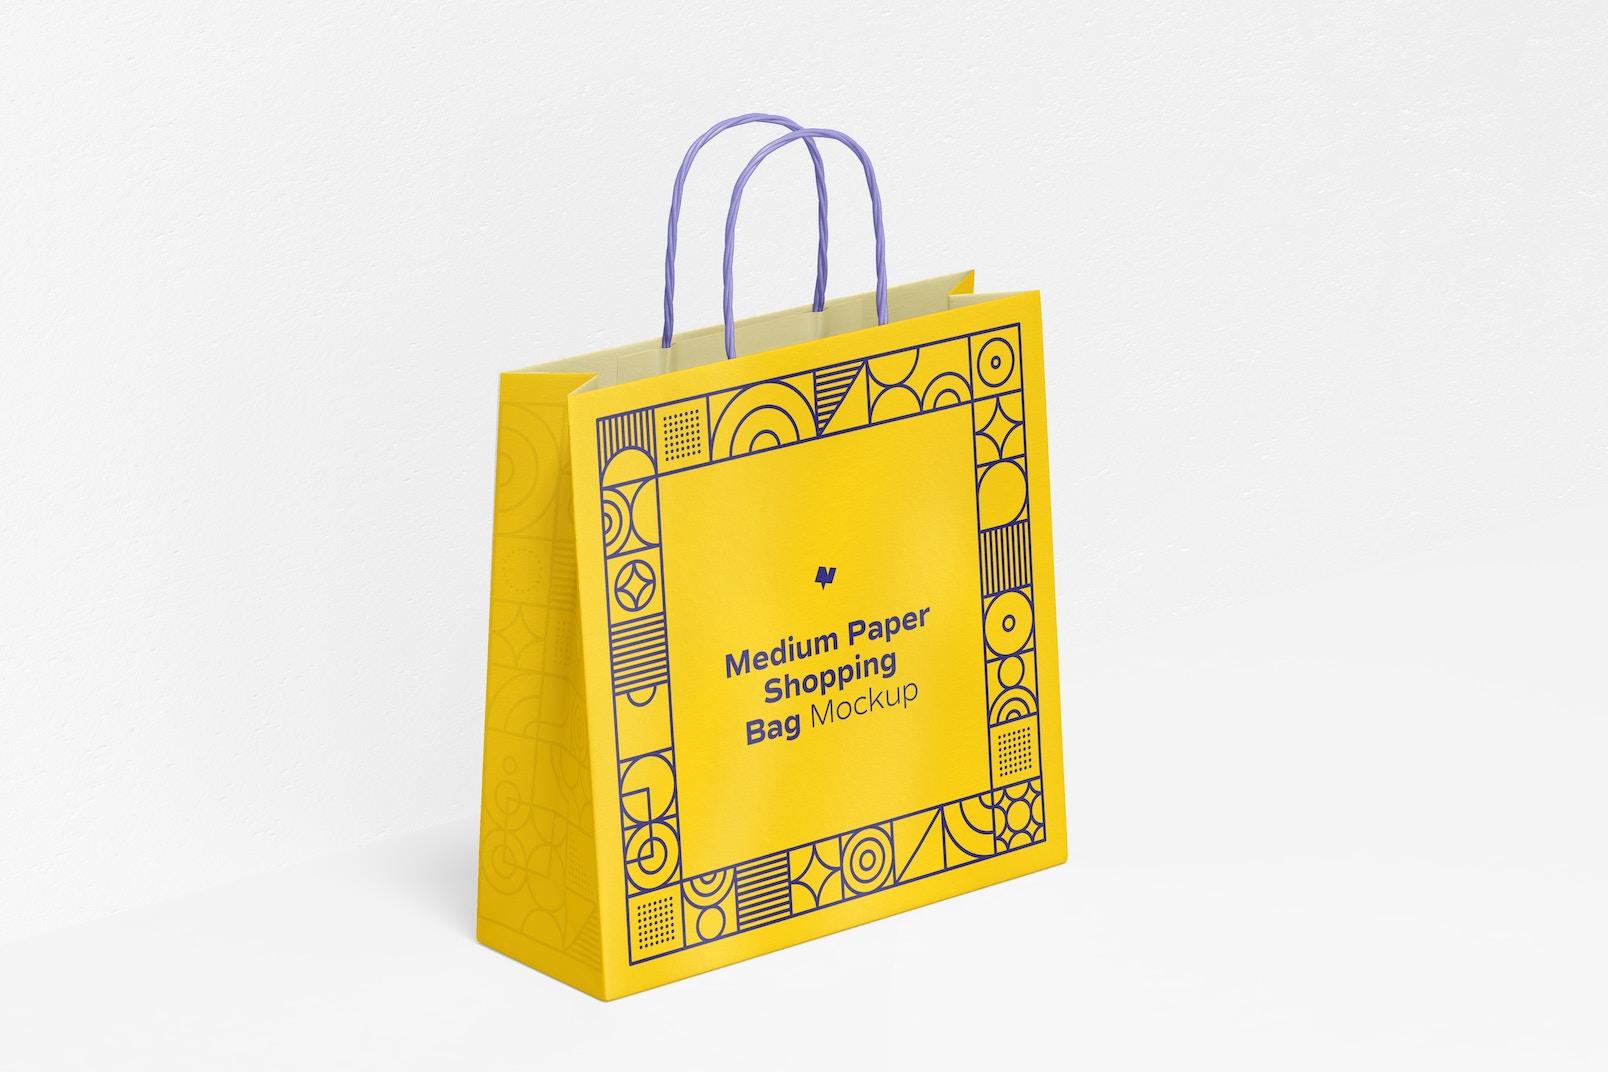 Medium Paper Shopping Bag Mockup